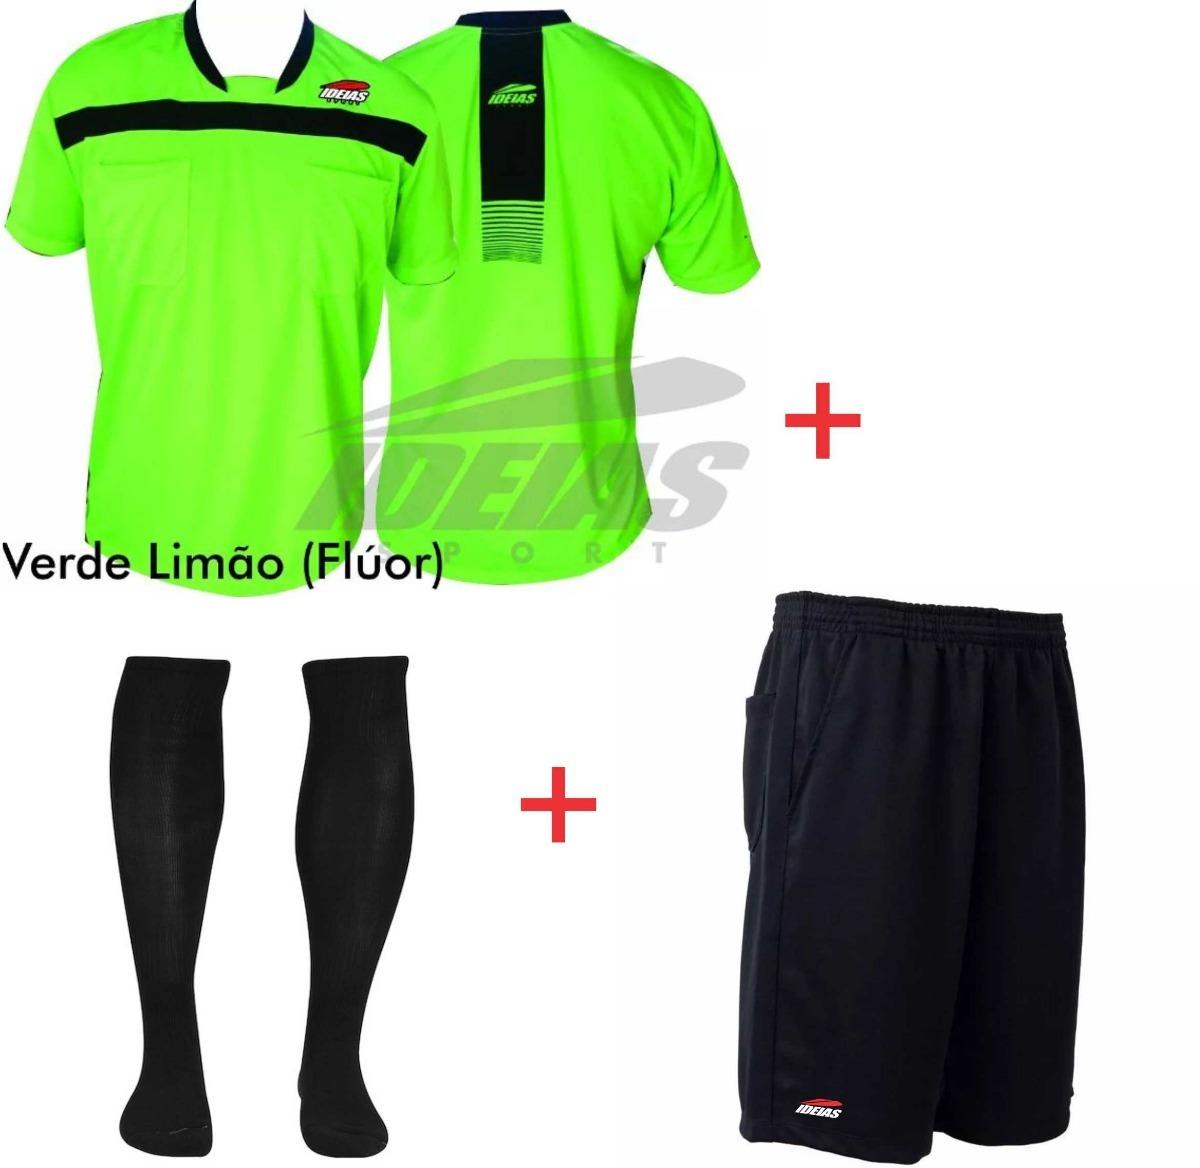 Kit Arbitro De Futebol Camisa + Shorts + Meião Profissional - R  96 ... 7157818887a78